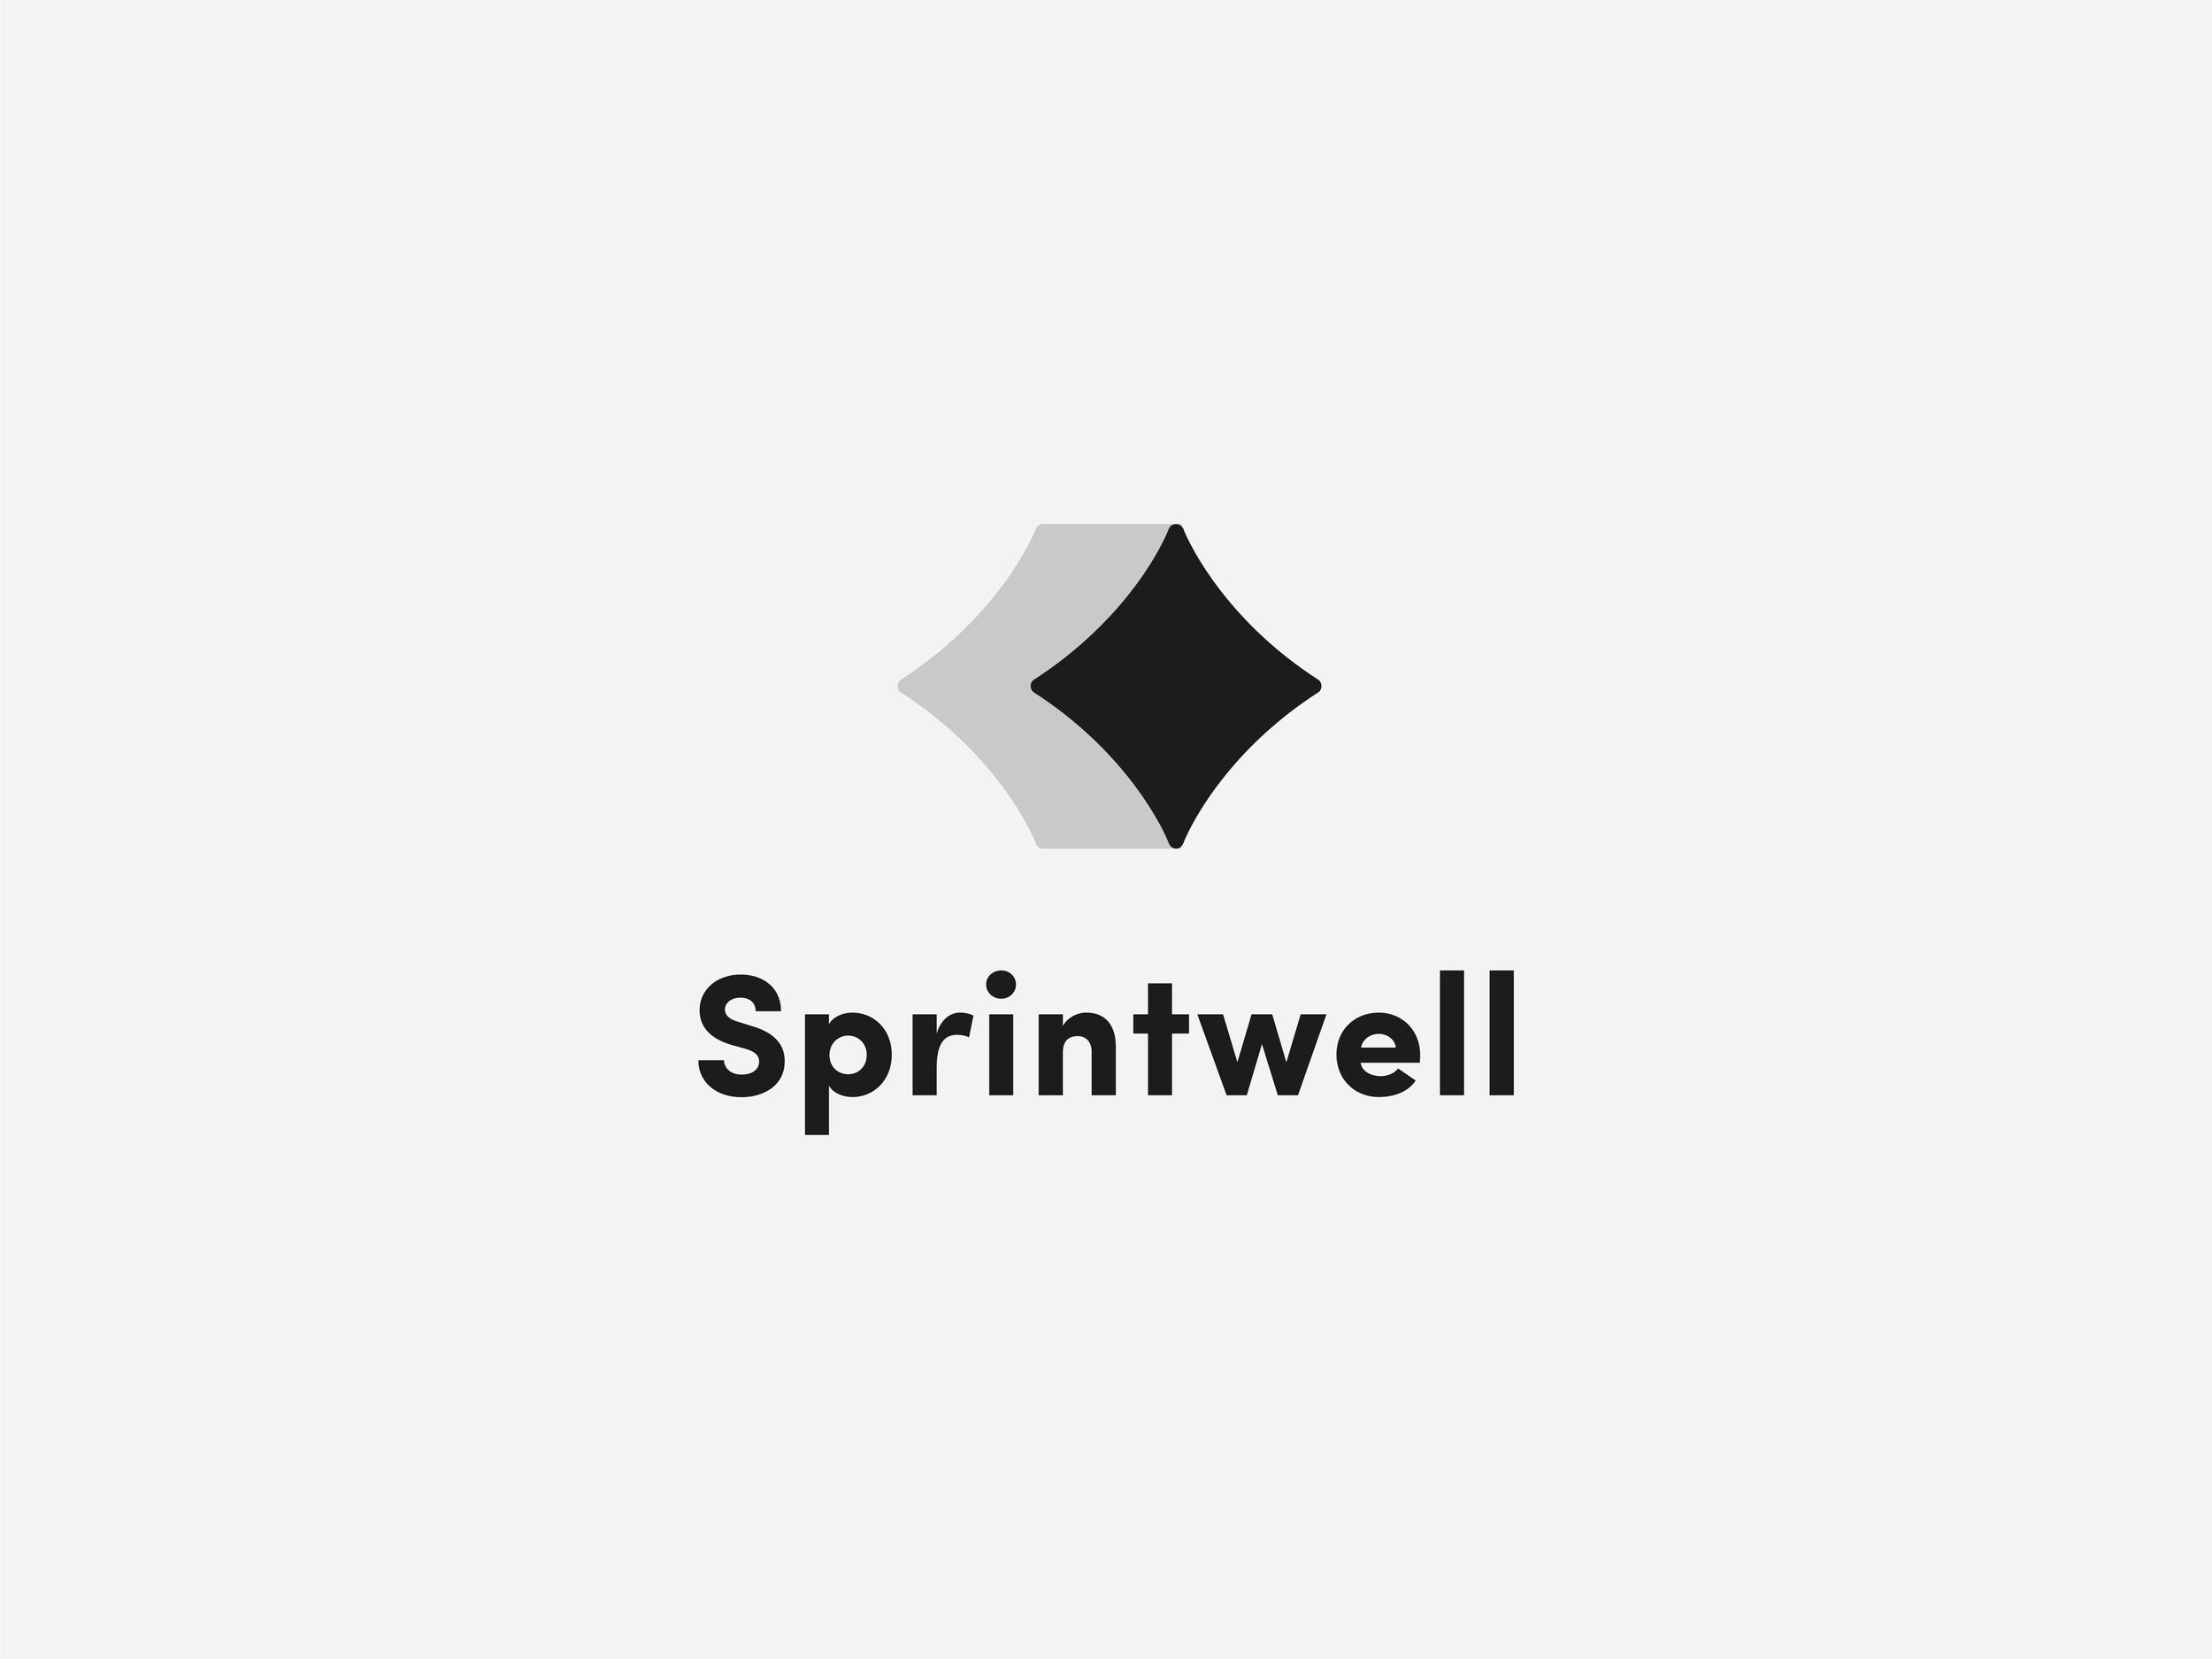 Sprintwell-LogoExplorations-03.png